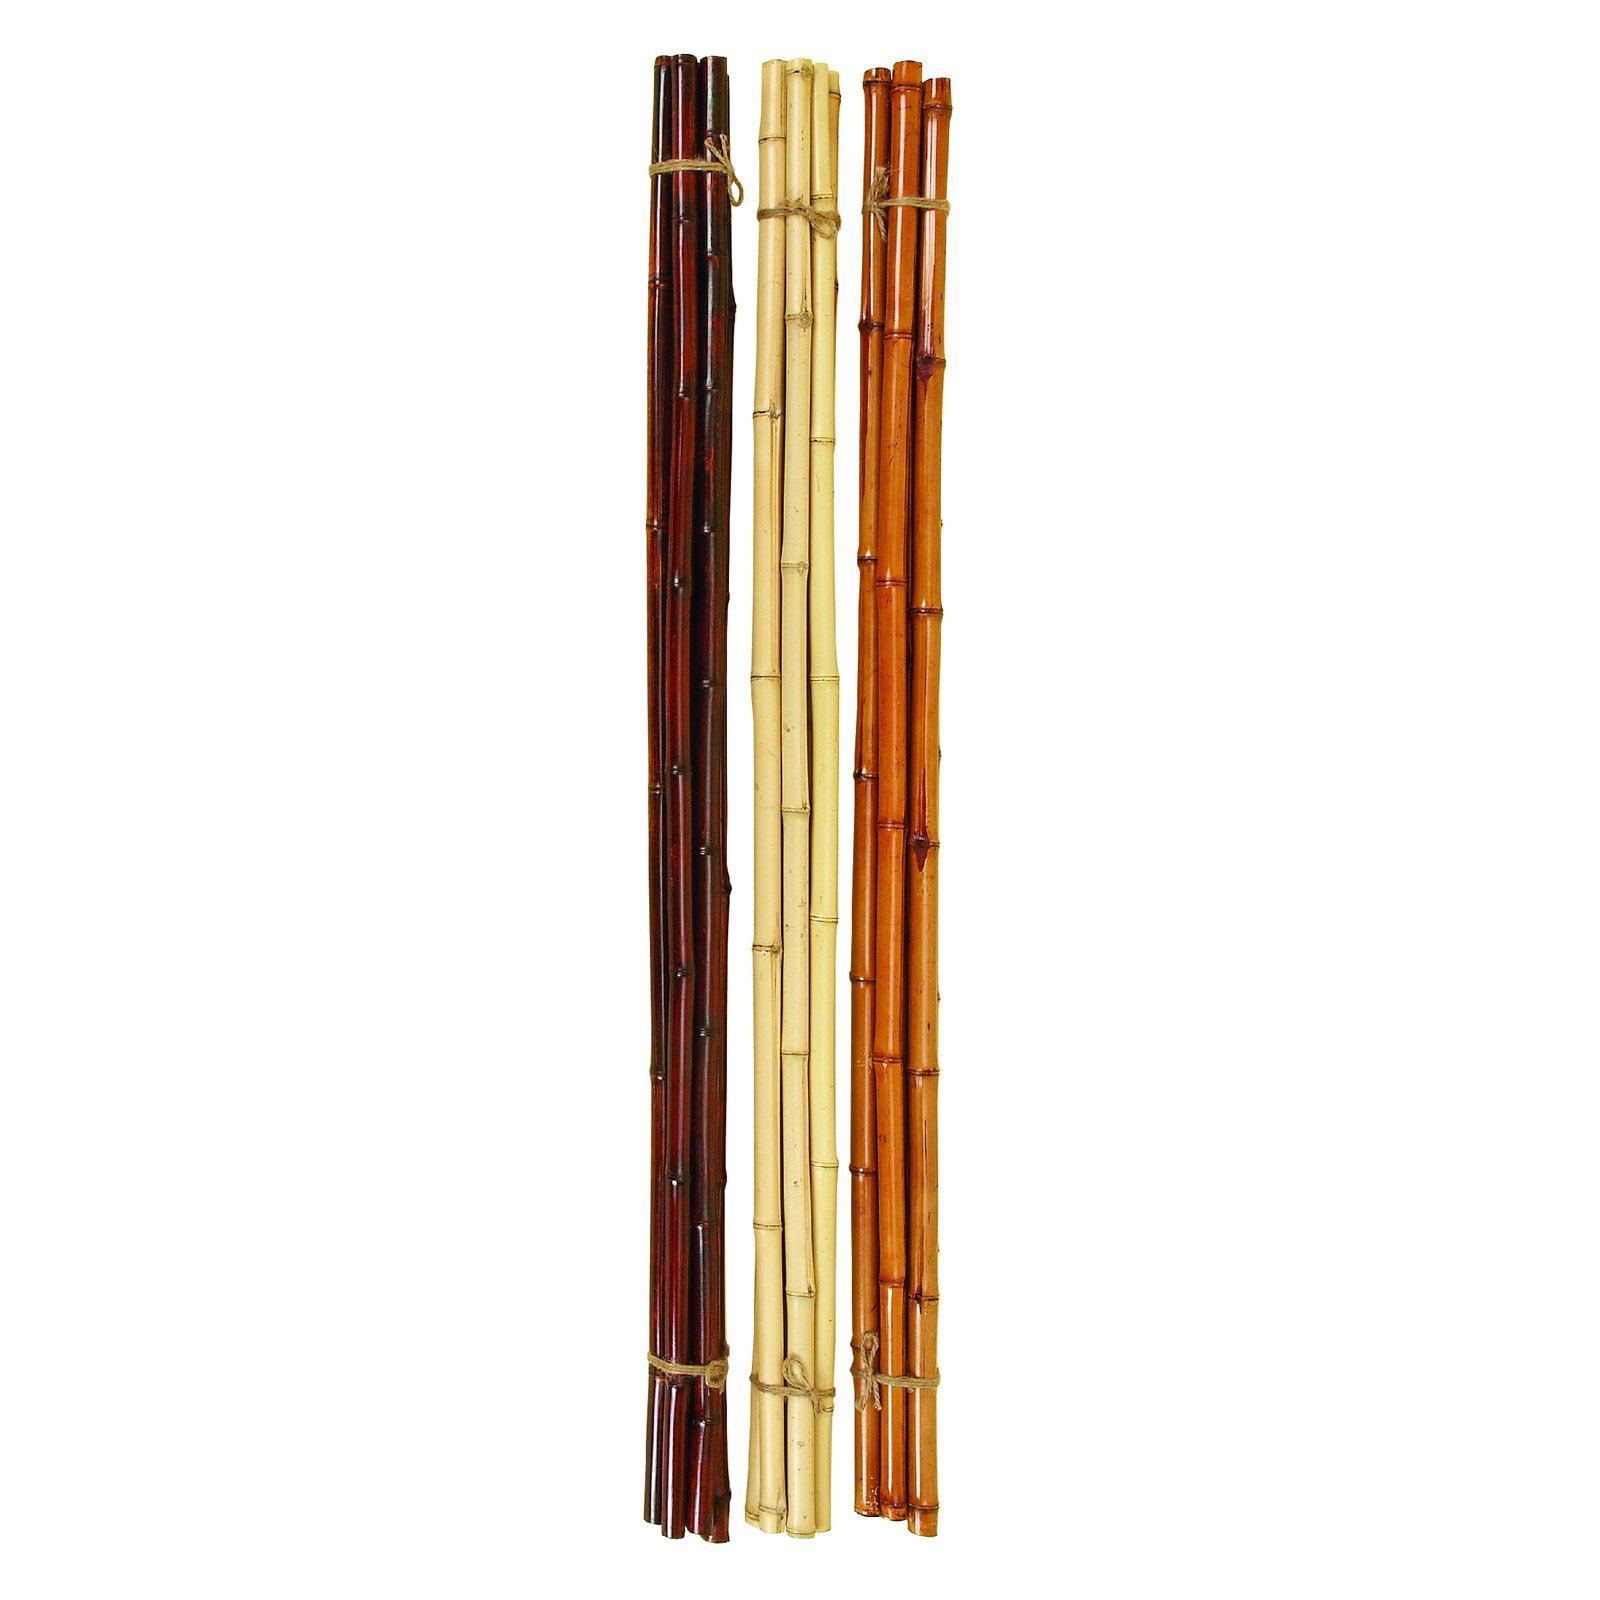 DecMode Bamboo Bunch Sculpture Set of 3 by Benzara